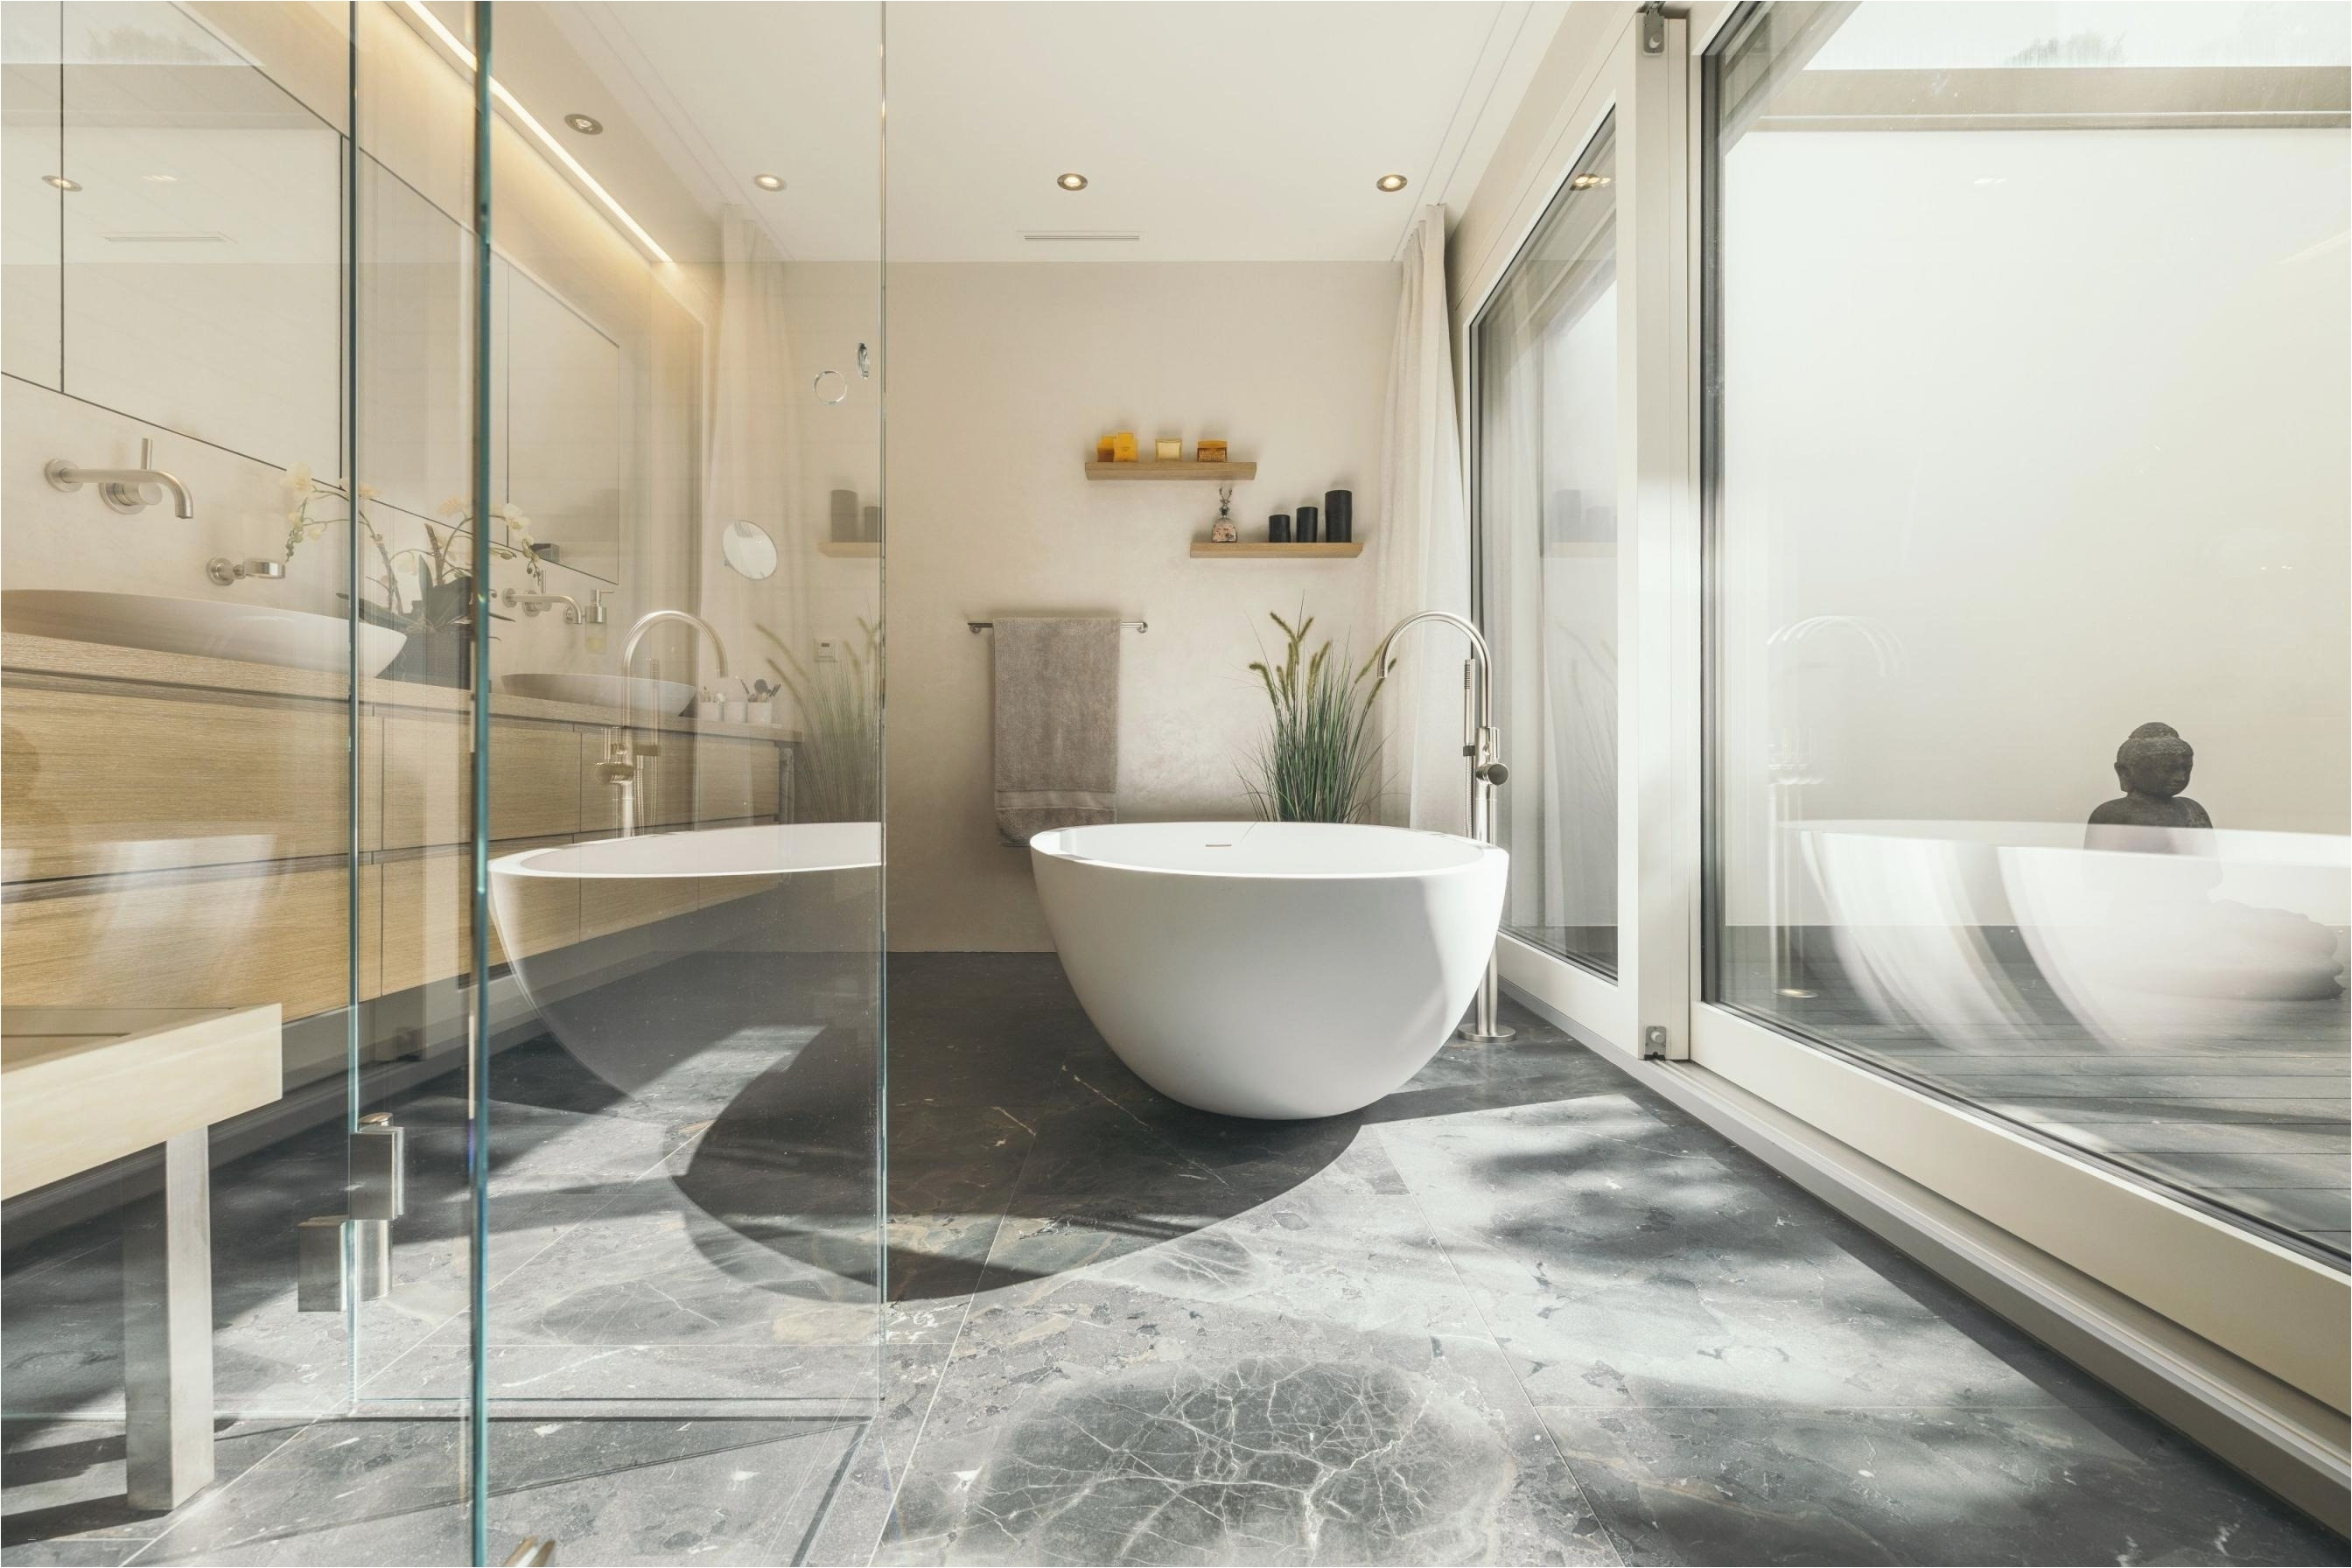 Modern Italian Bathroom Design Ideas 28 Modern Italian Bathroom Design Ideas norwin Home Design